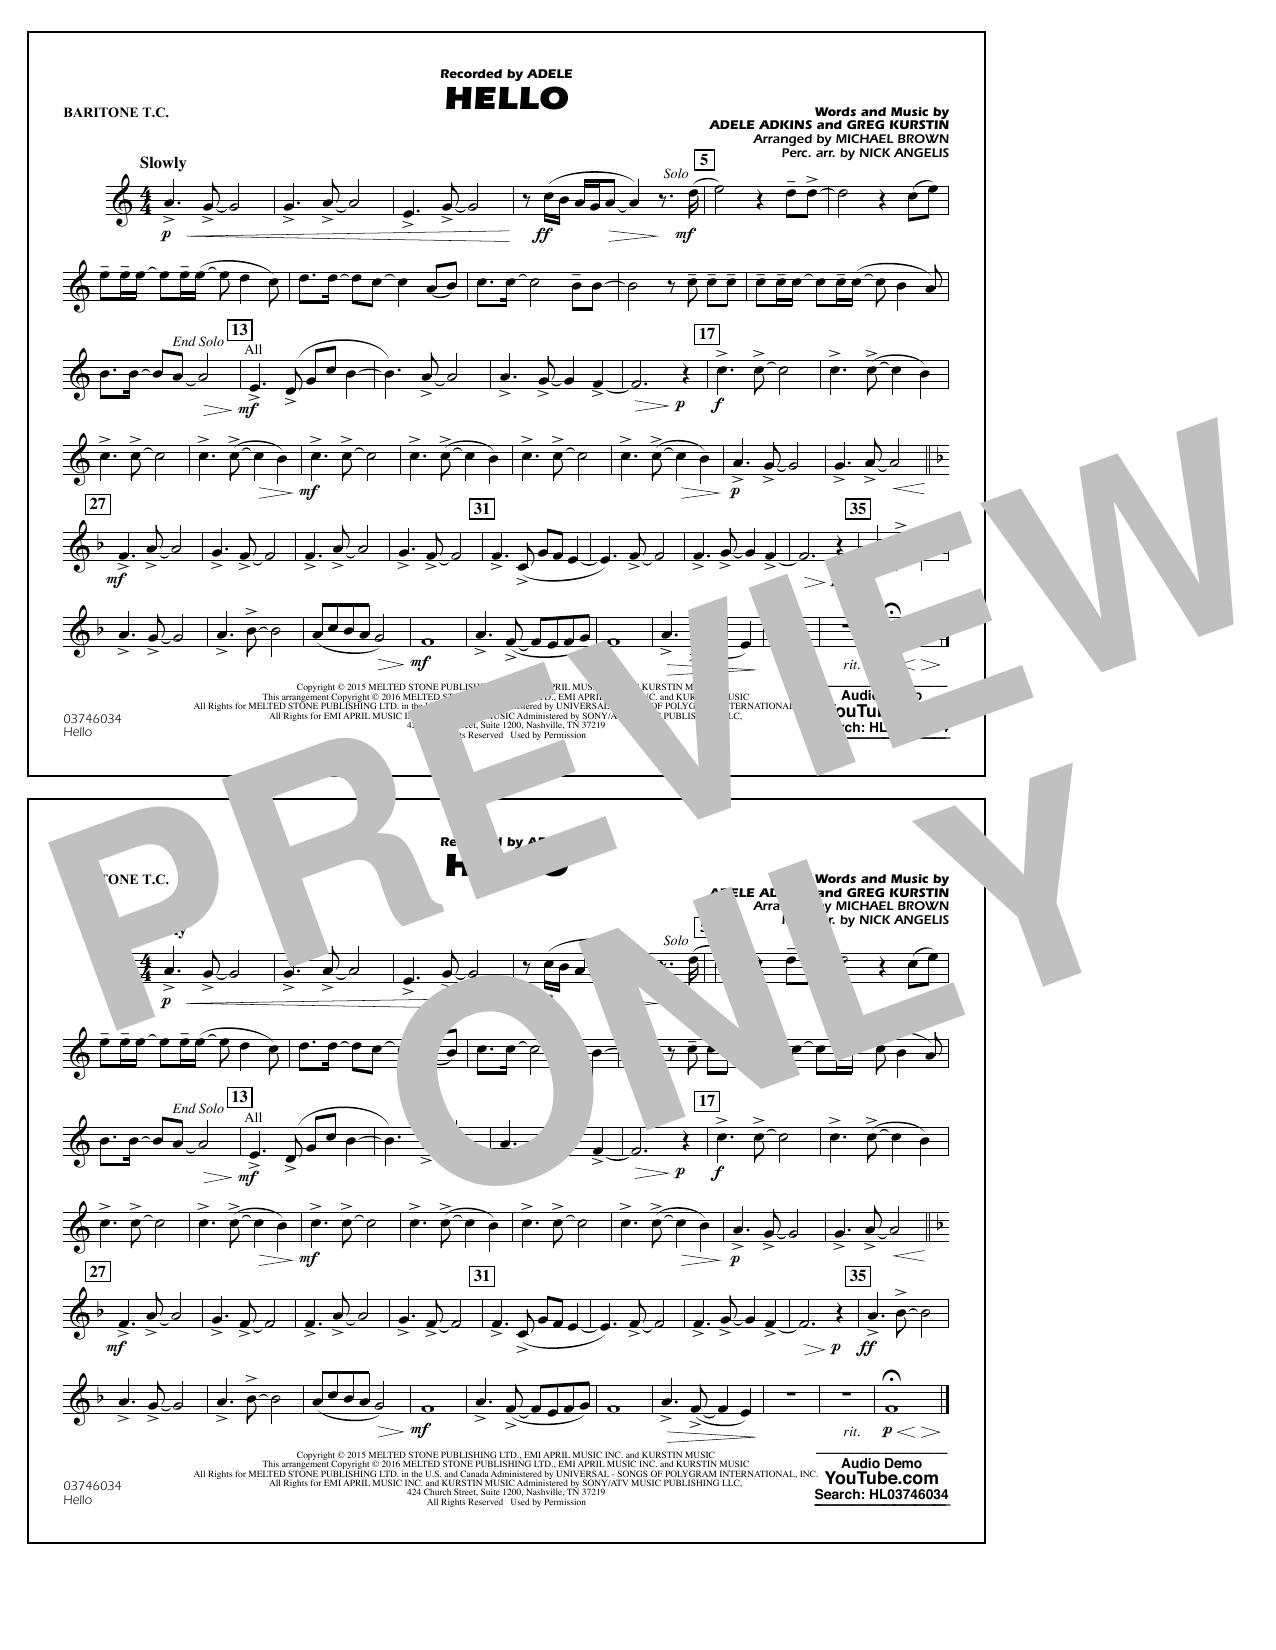 Hello - Baritone T.C. (Marching Band)